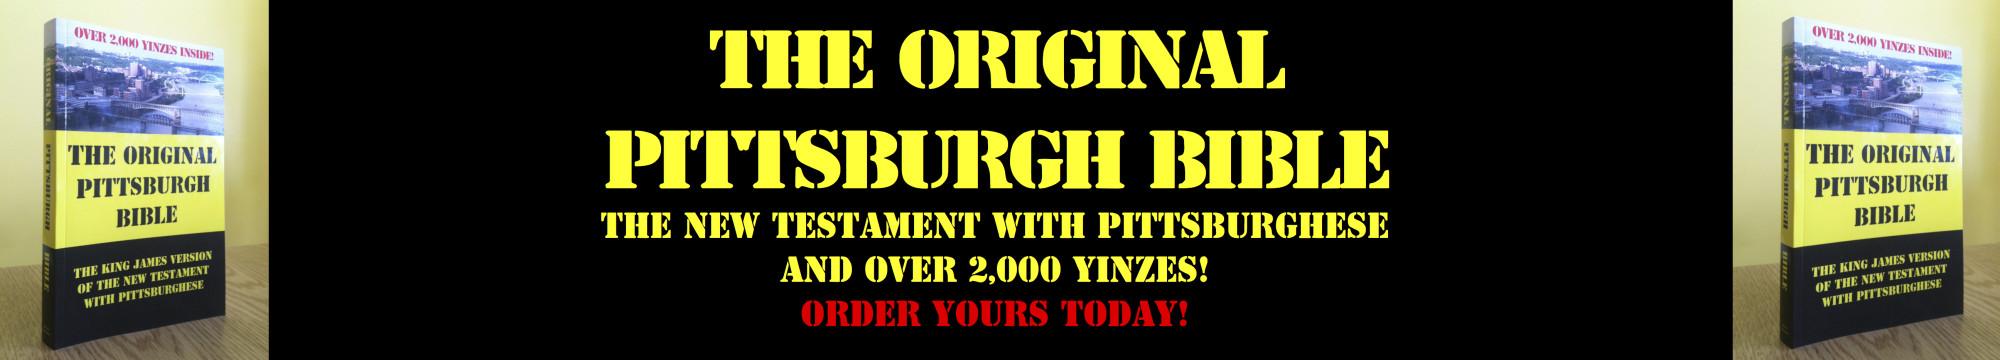 The Original Pittsburgh Bible